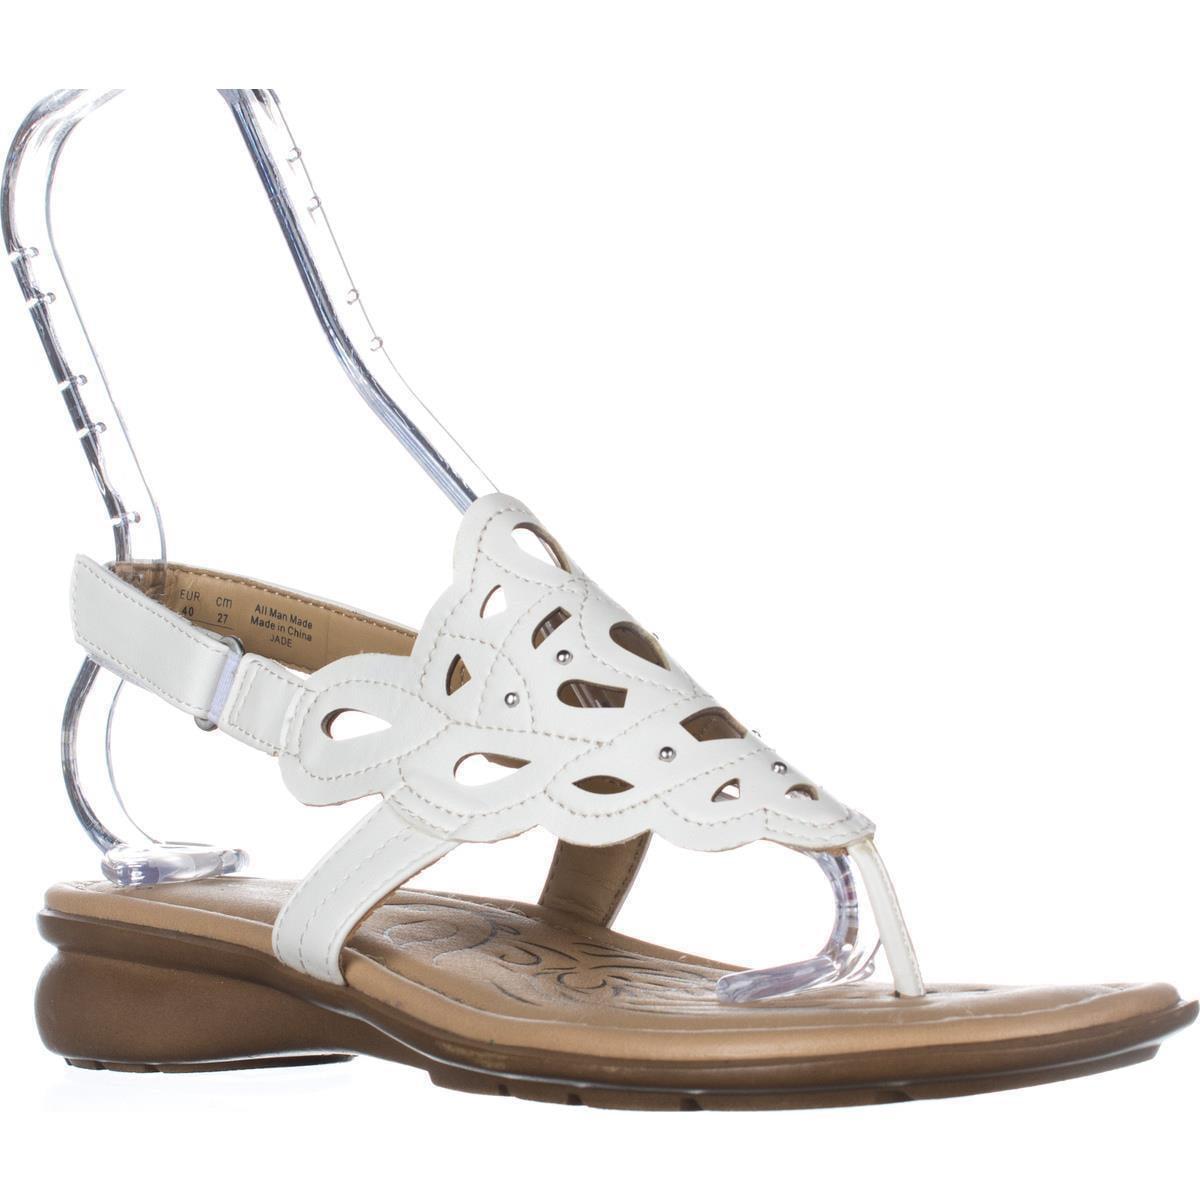 Womens Naturalizer Jade Thong Round Toe Sandals, White by Naturalizer